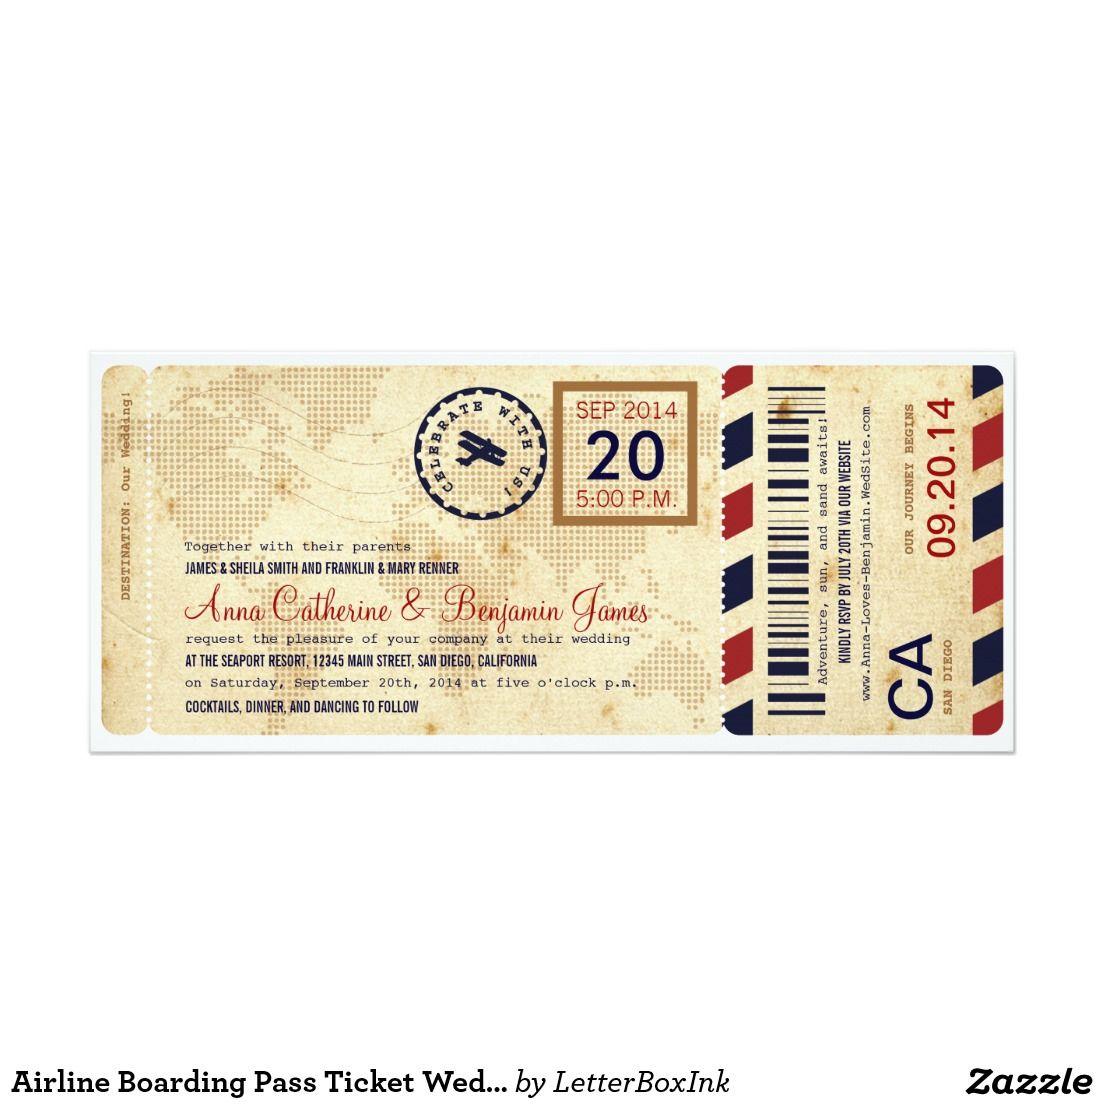 plane ticket wedding invitation free template - 100 images ...